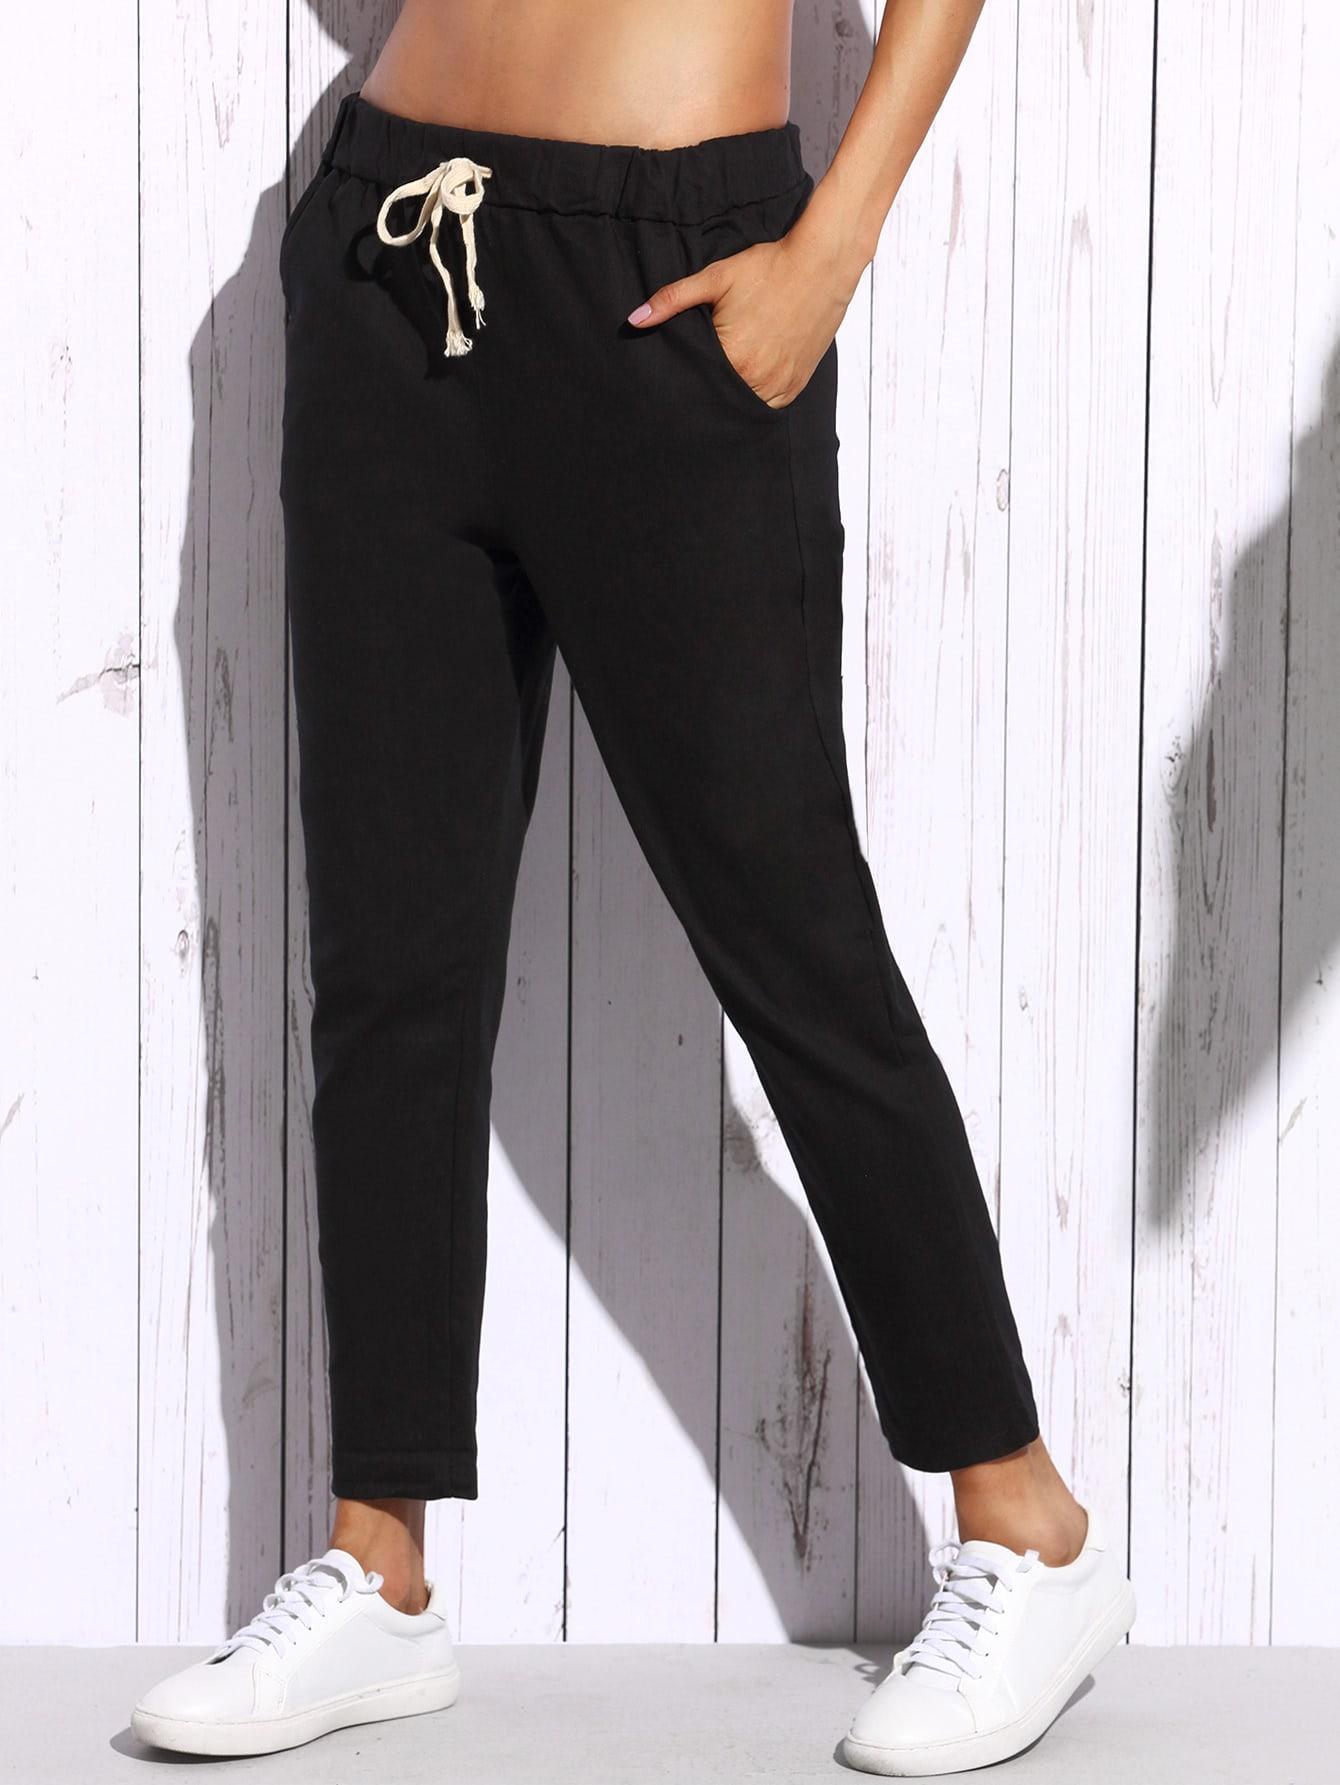 Drawstring Waist Ankle Tapered Jeans drawstring waist tapered leg jogger